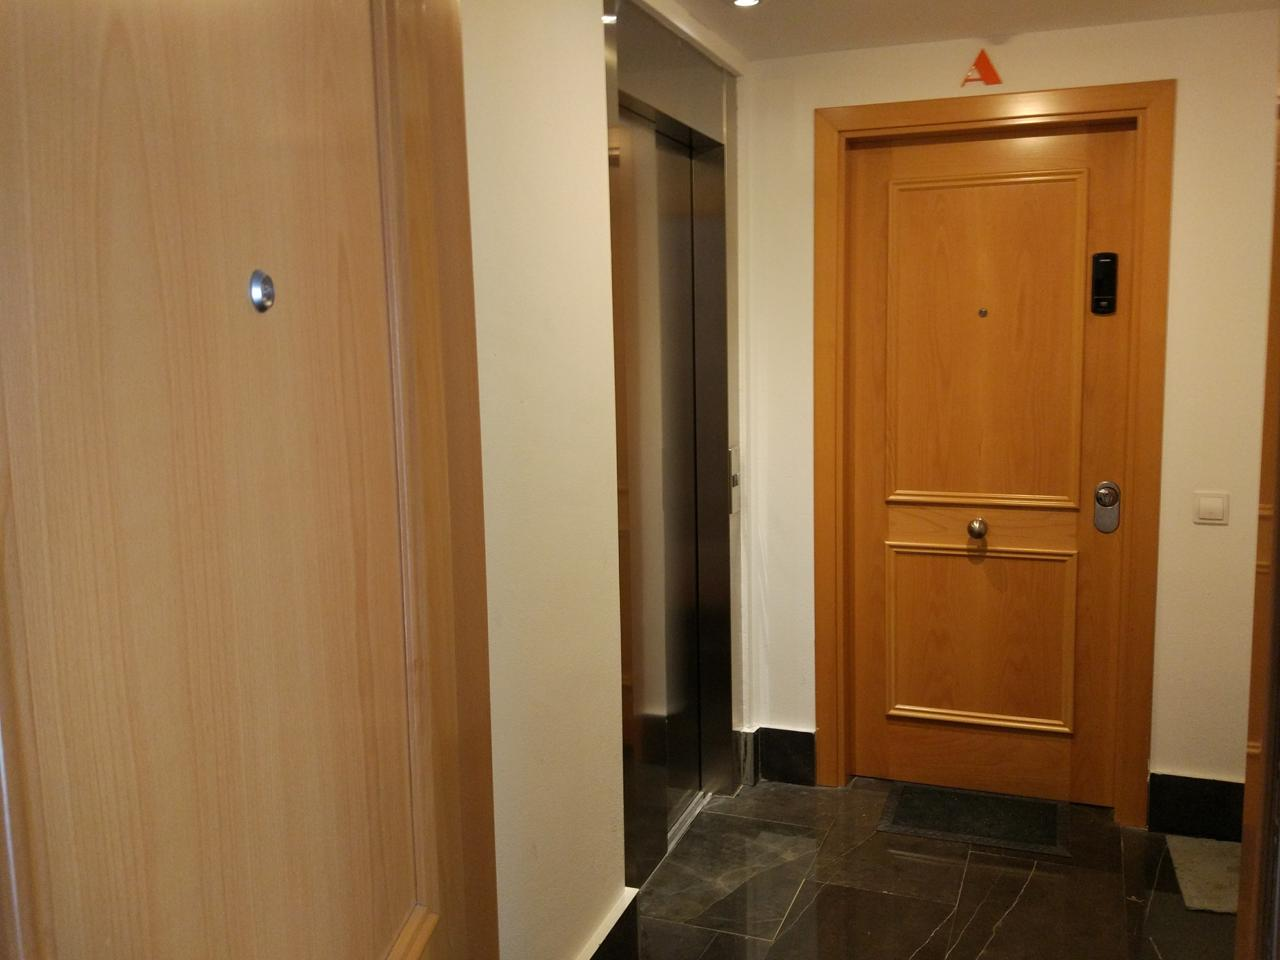 piso inversores con inquilino obra nueva zaragoza|publipisos inmobiliarias-12